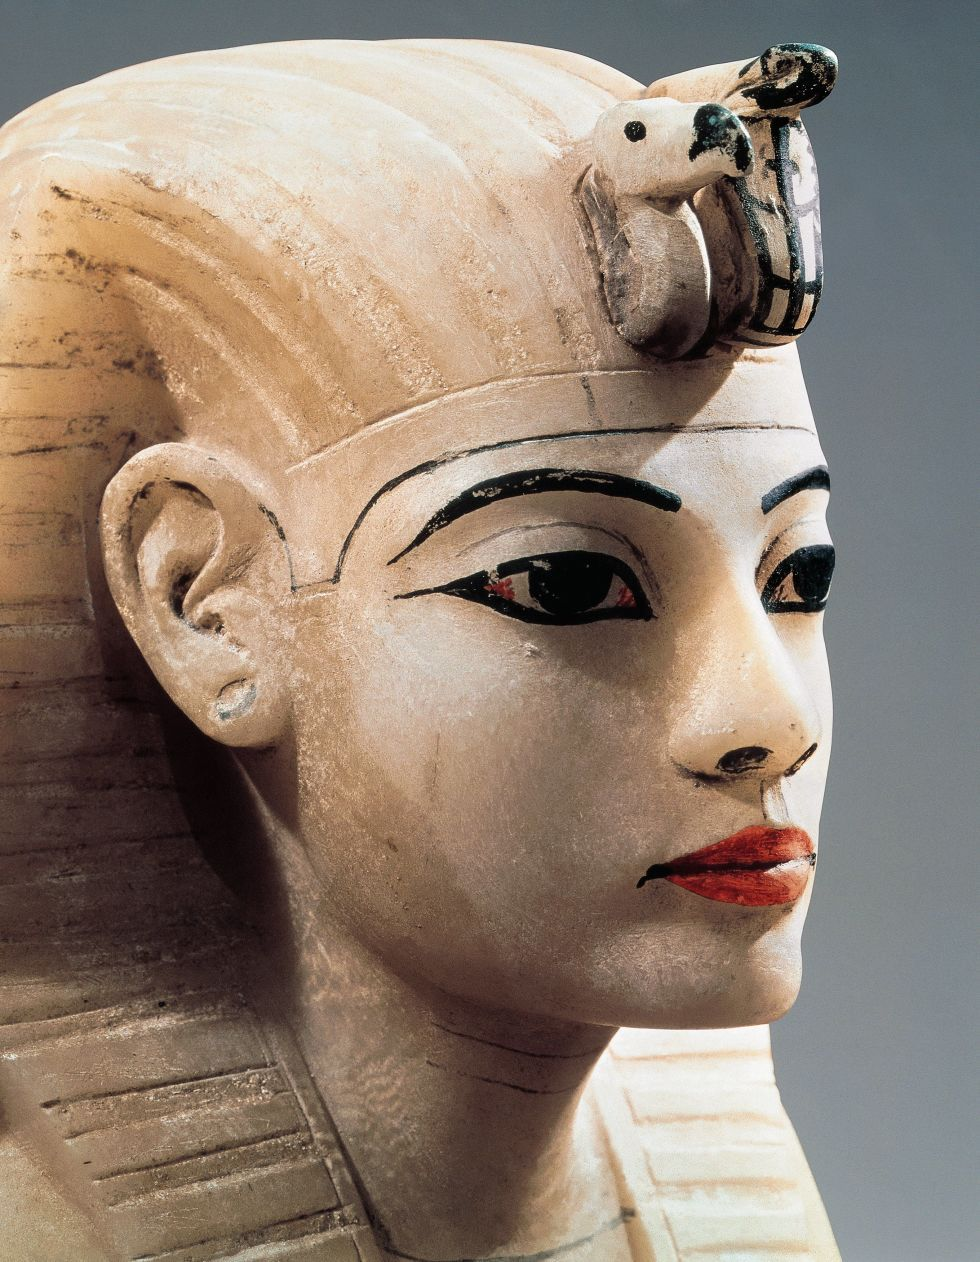 10 Beauty Secrets from Ancient Egypt #beautysecrets